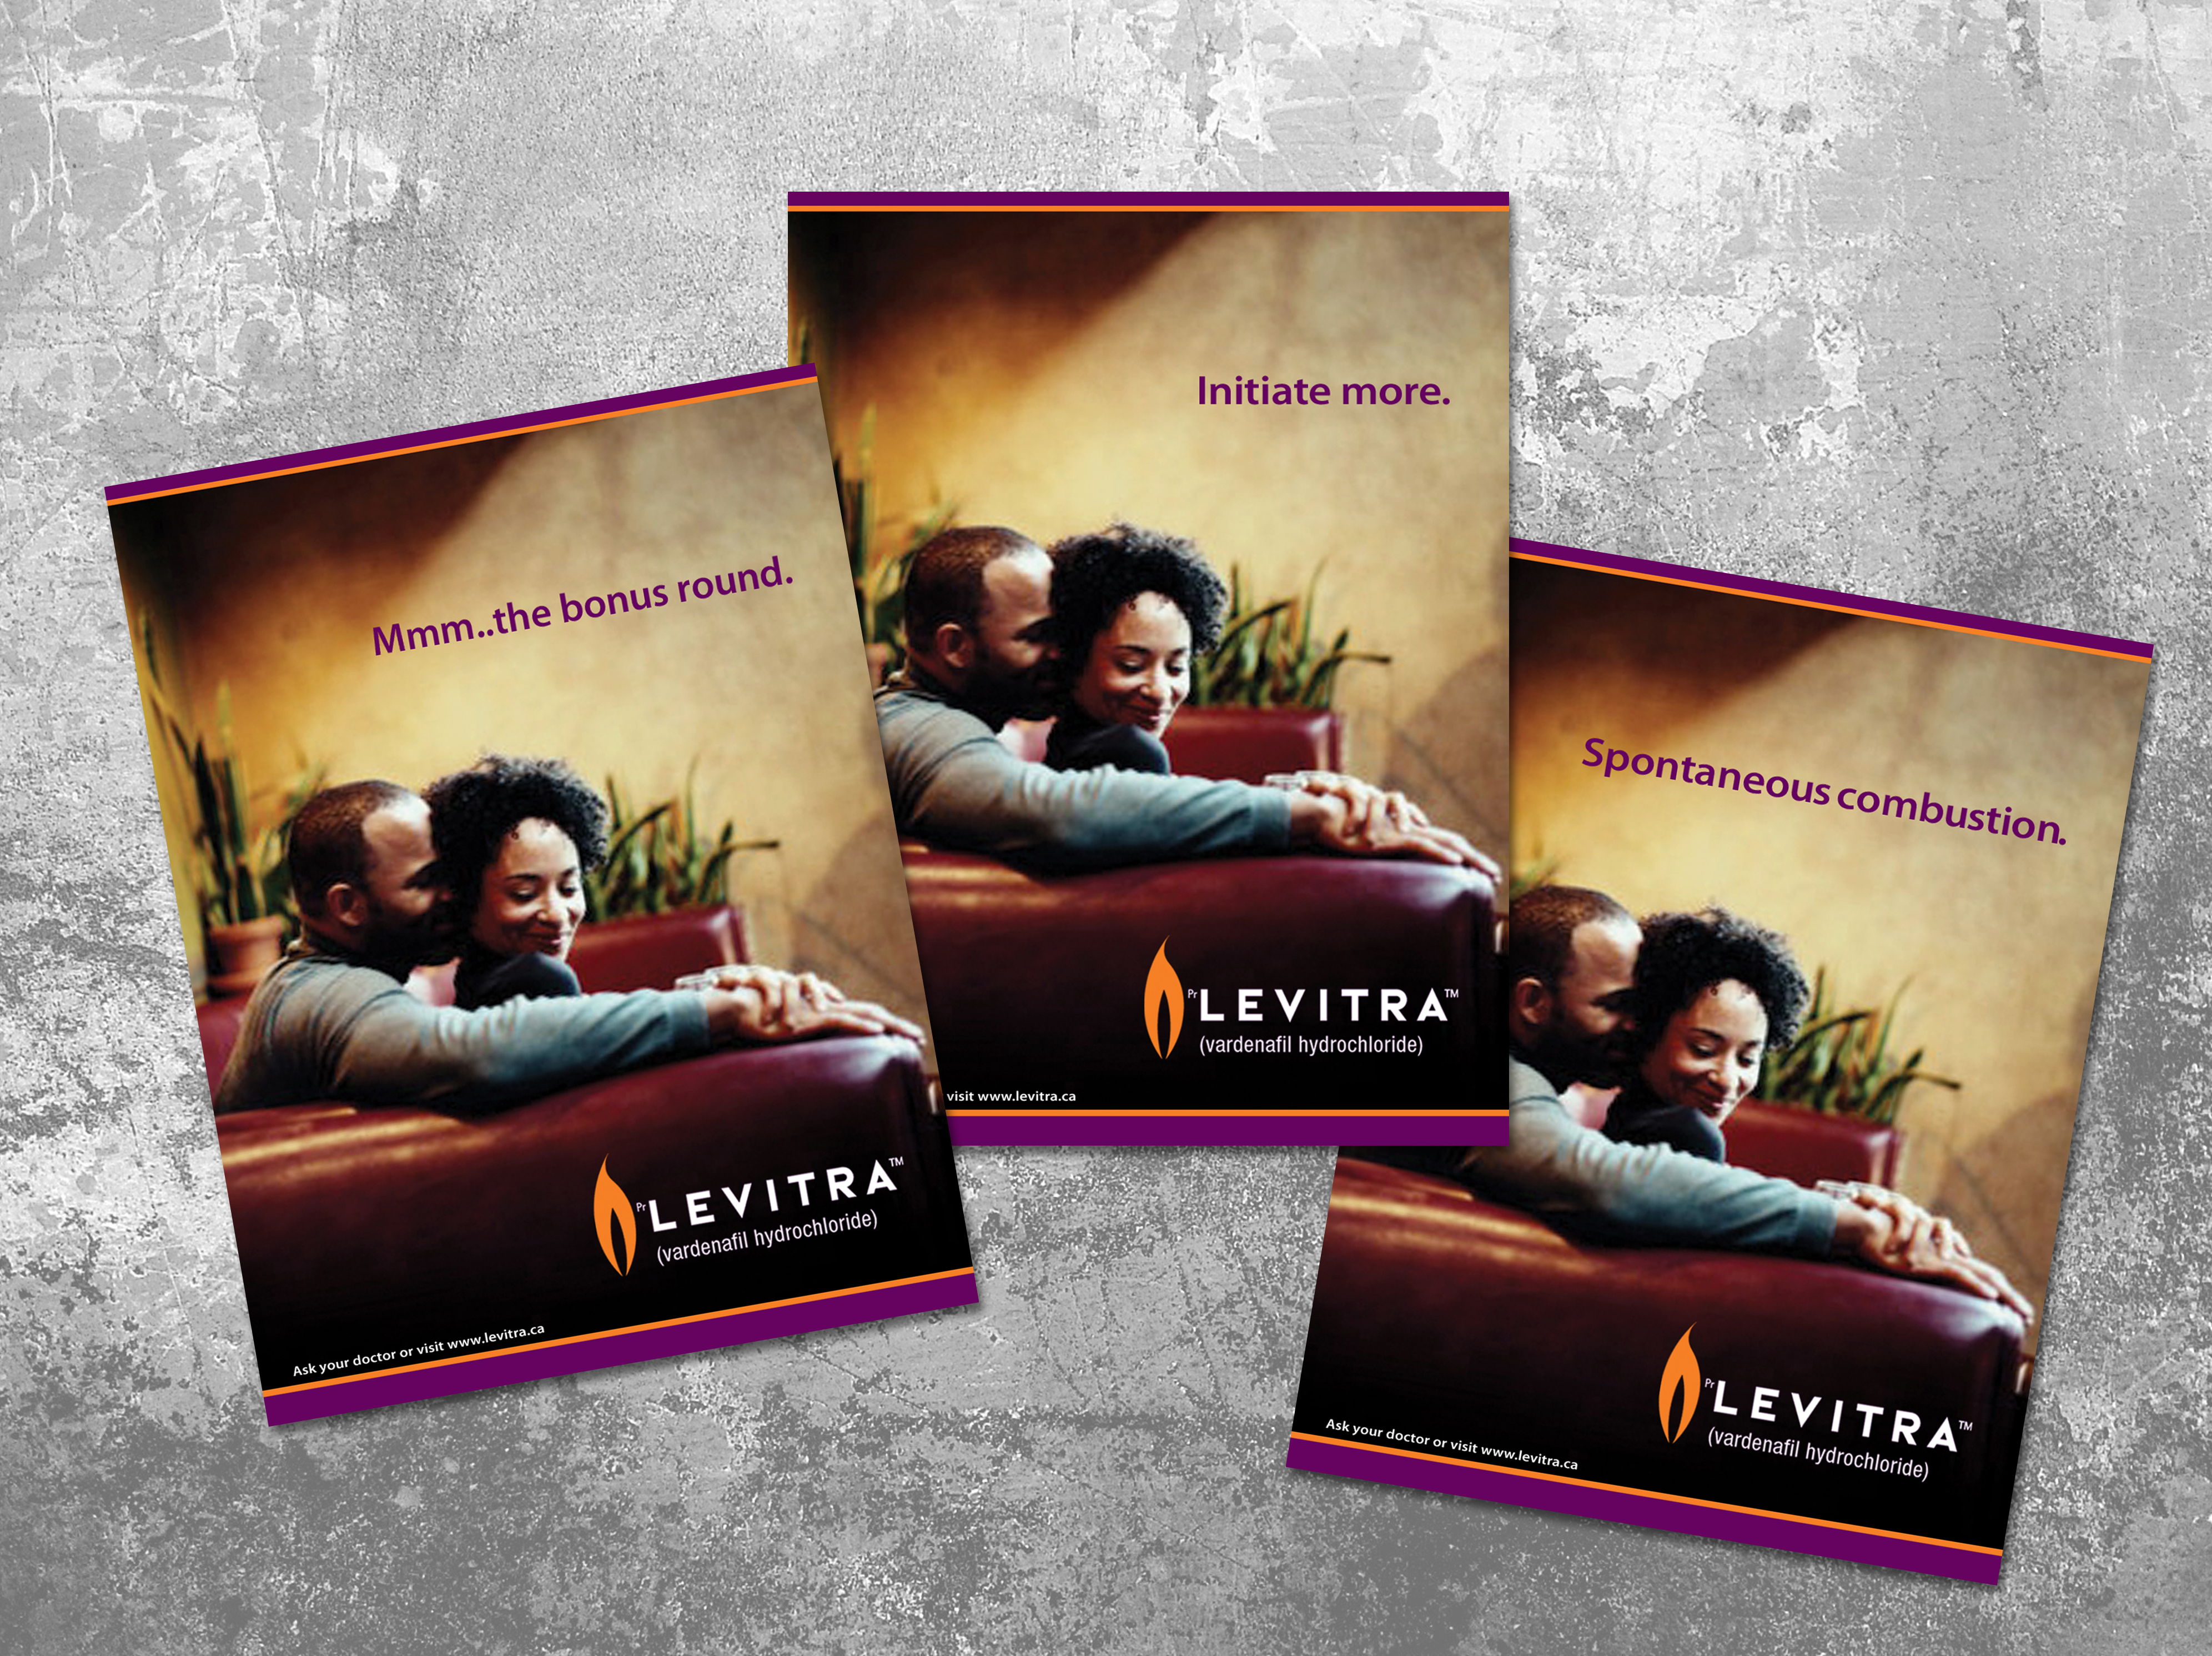 Levitra Ad campaign comps